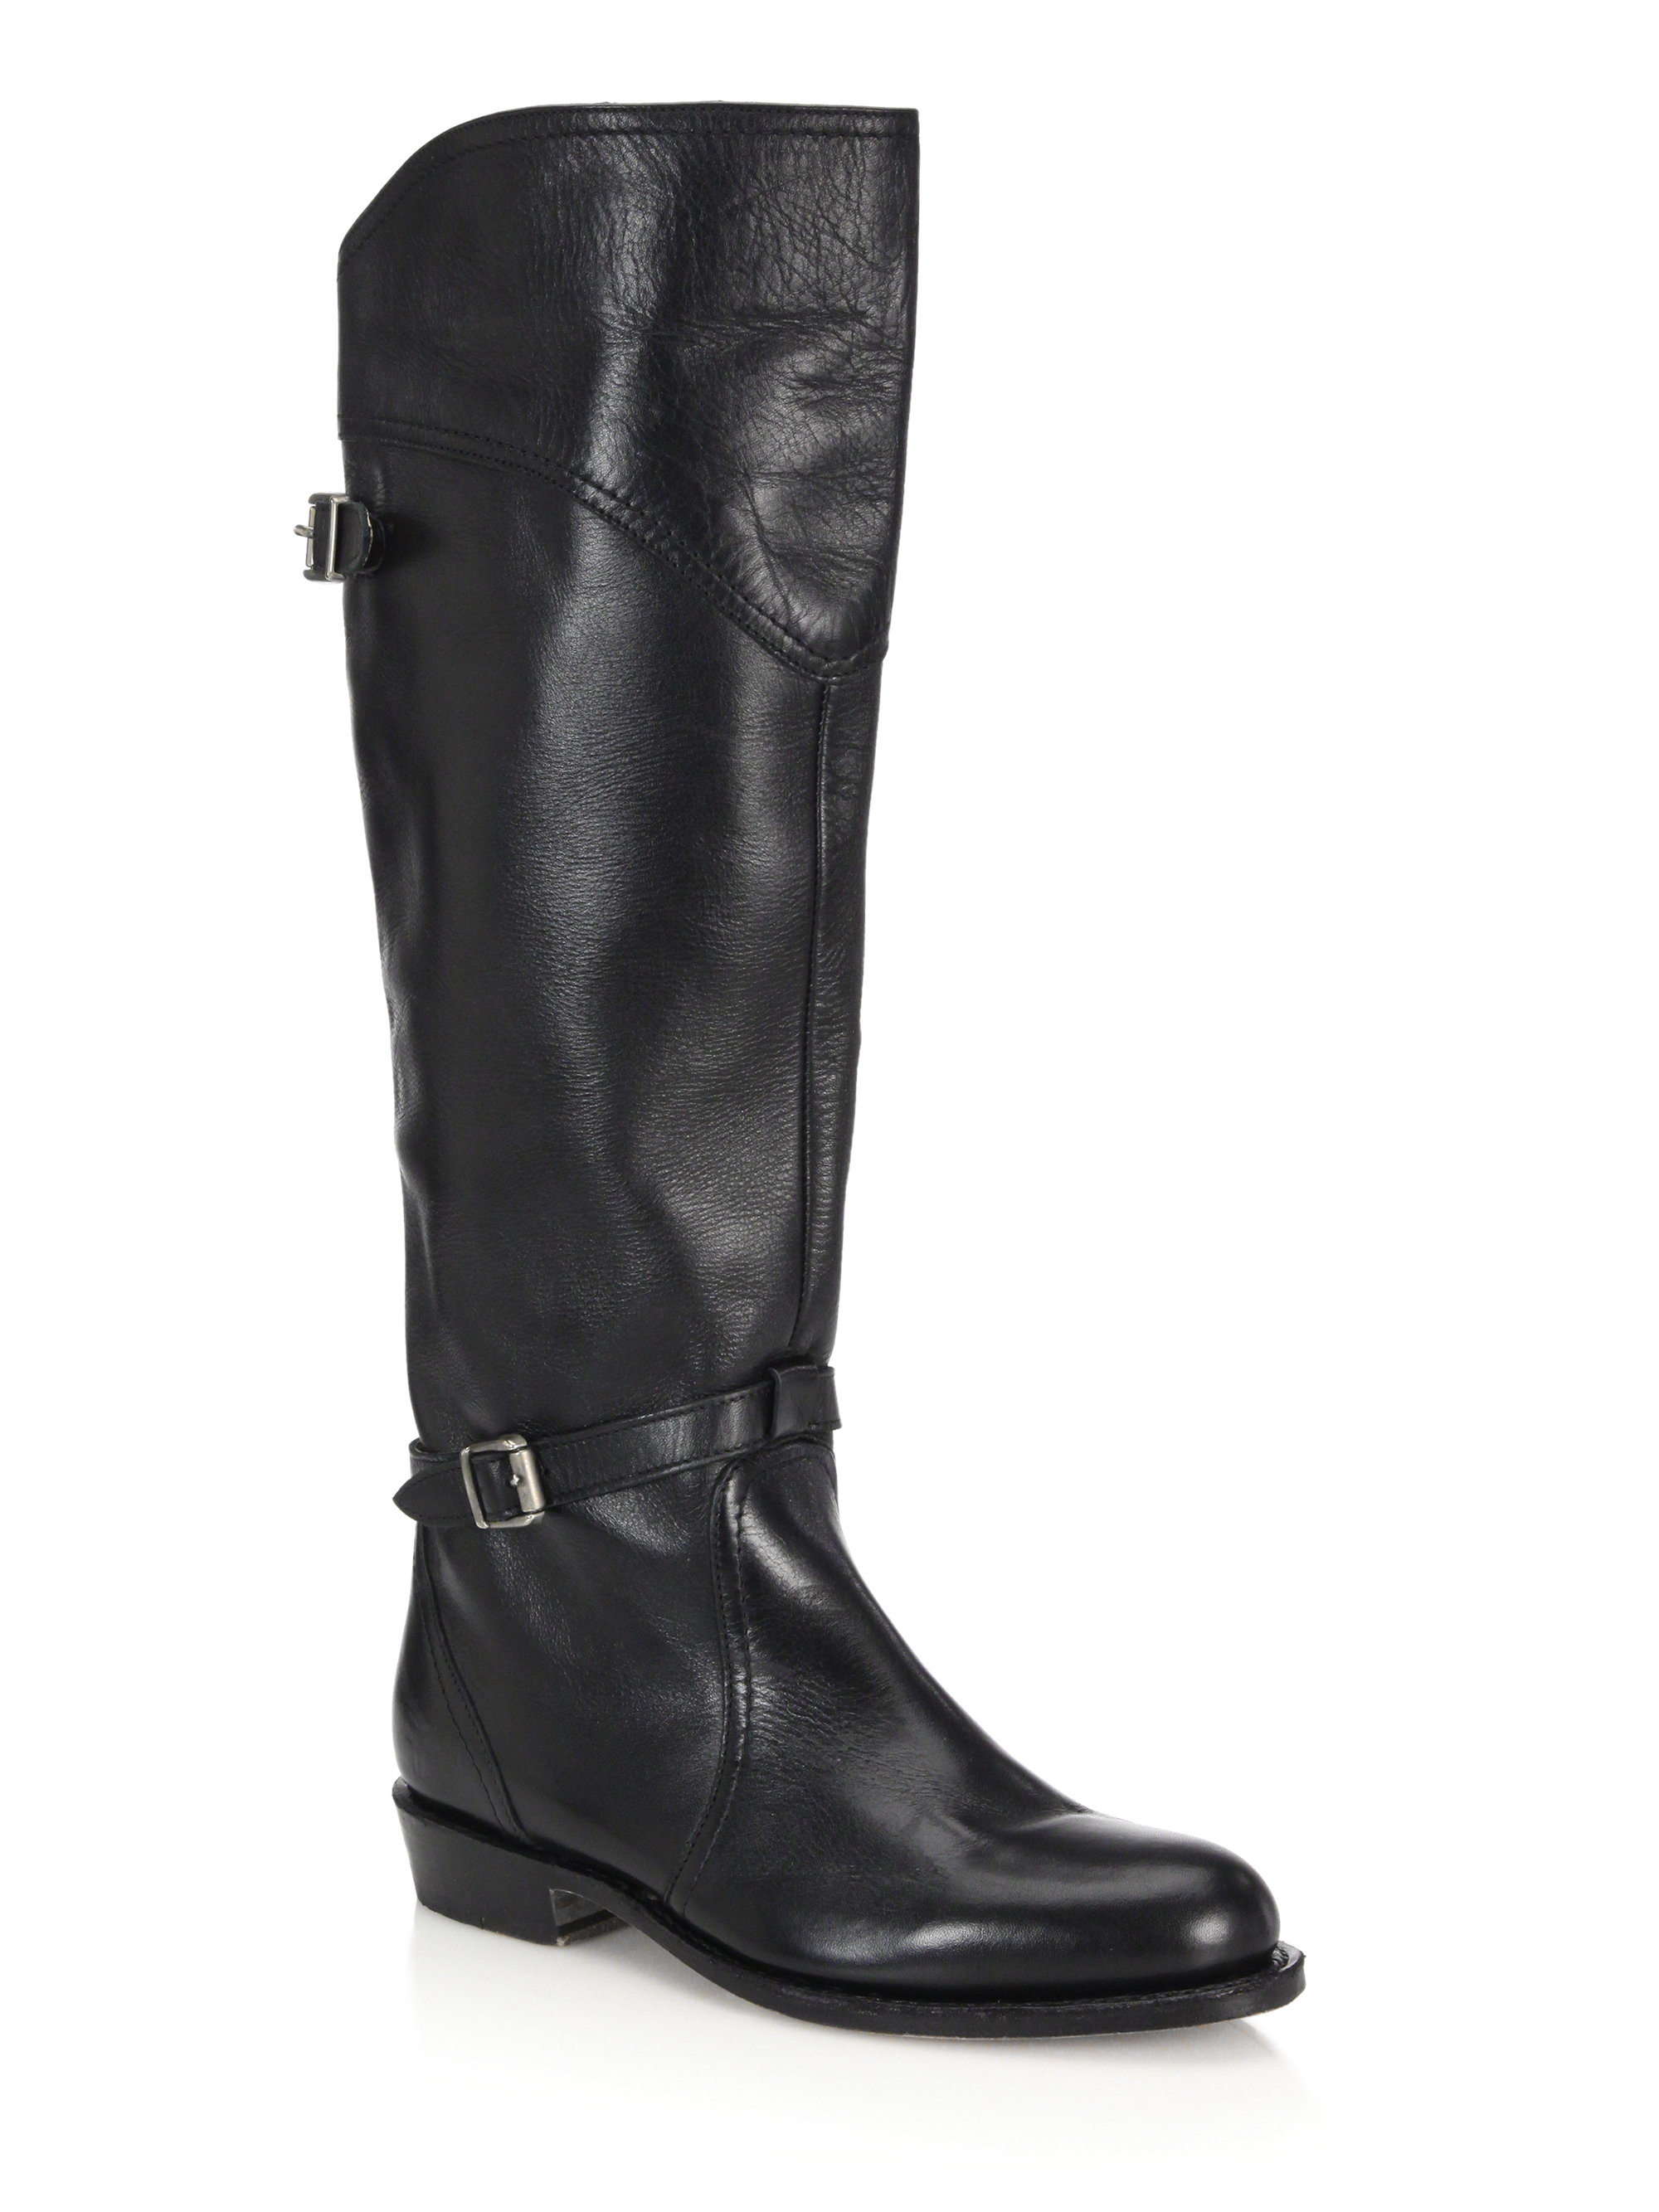 frye dorado leather boots in black lyst